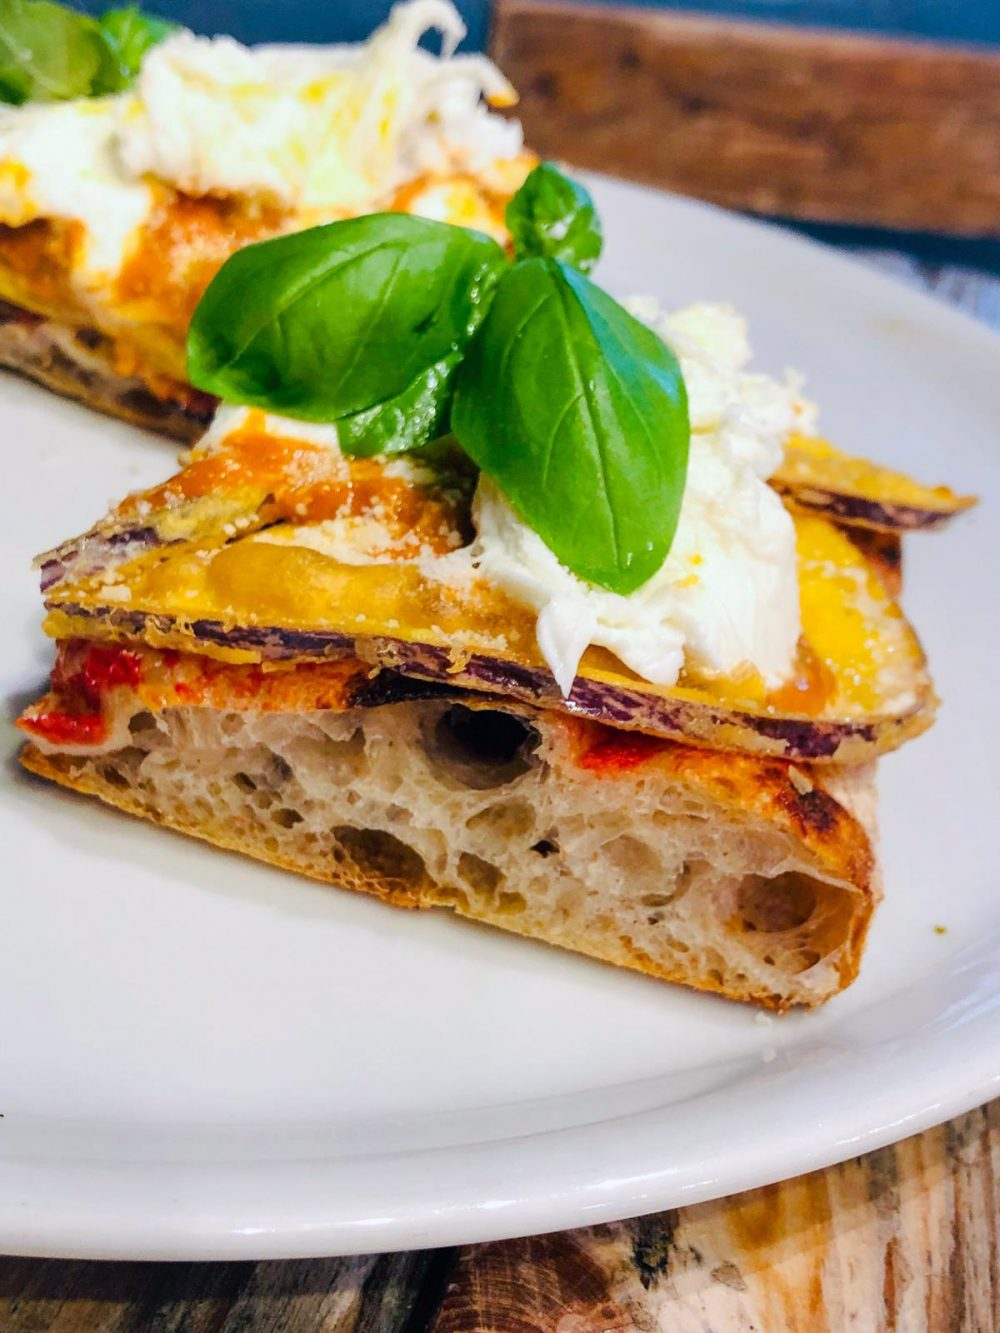 Lievito, Pizza, Pane